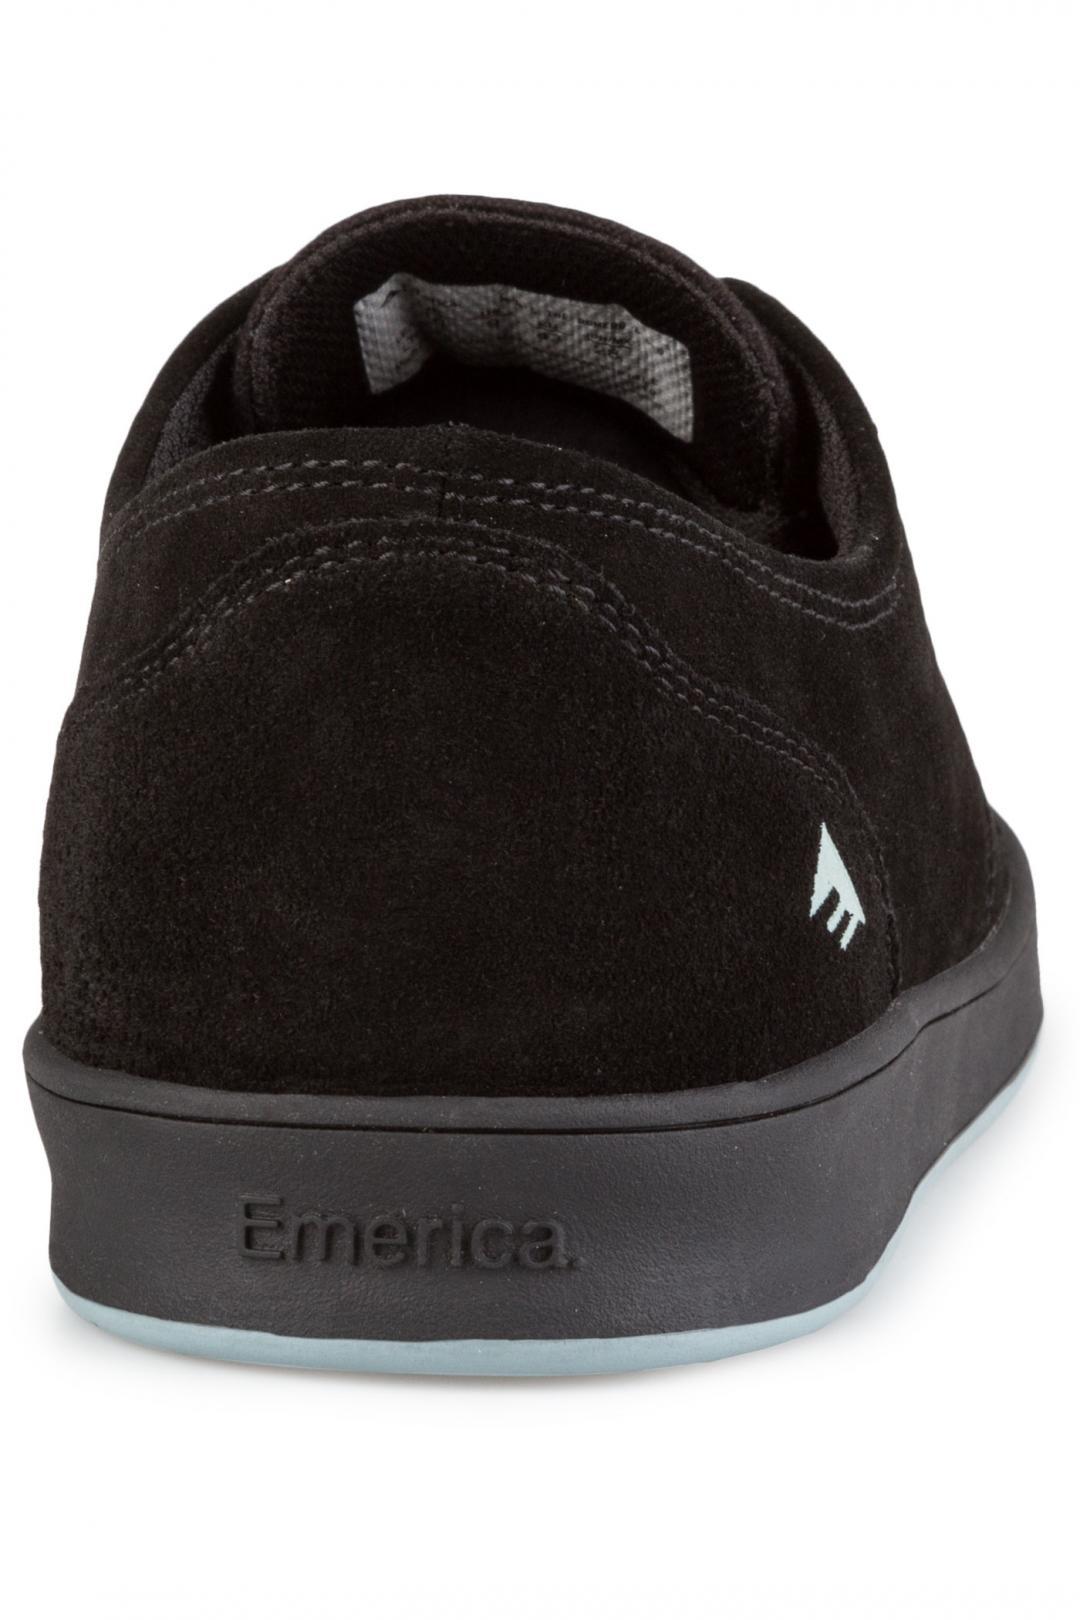 Uomo Emerica The Romero Laced black black blue | Sneakers low top